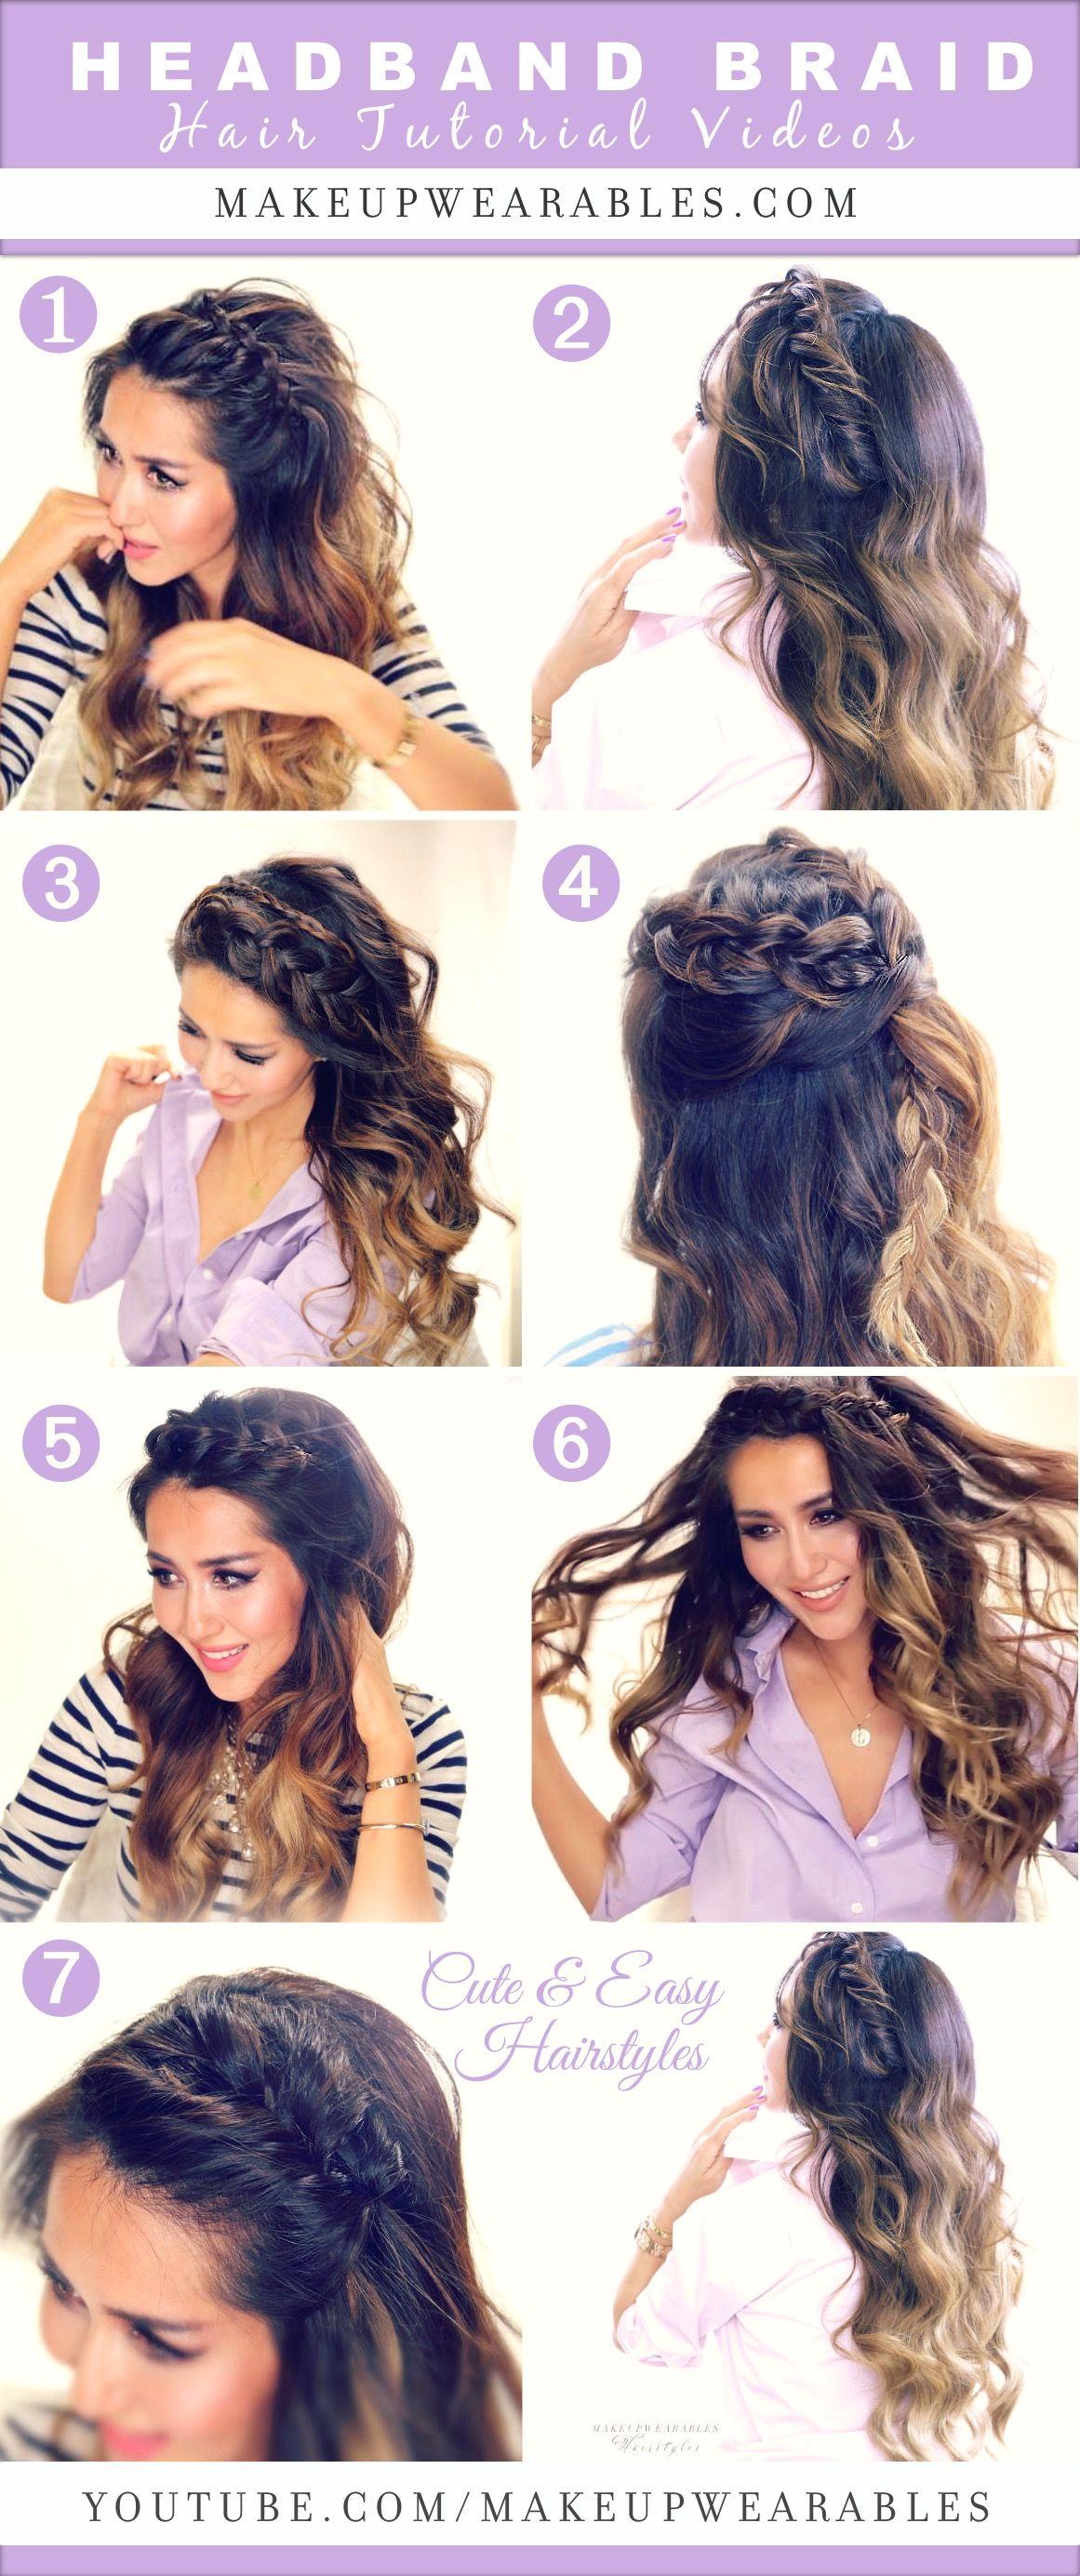 cute u easy headband braid hairstyles to try in hair